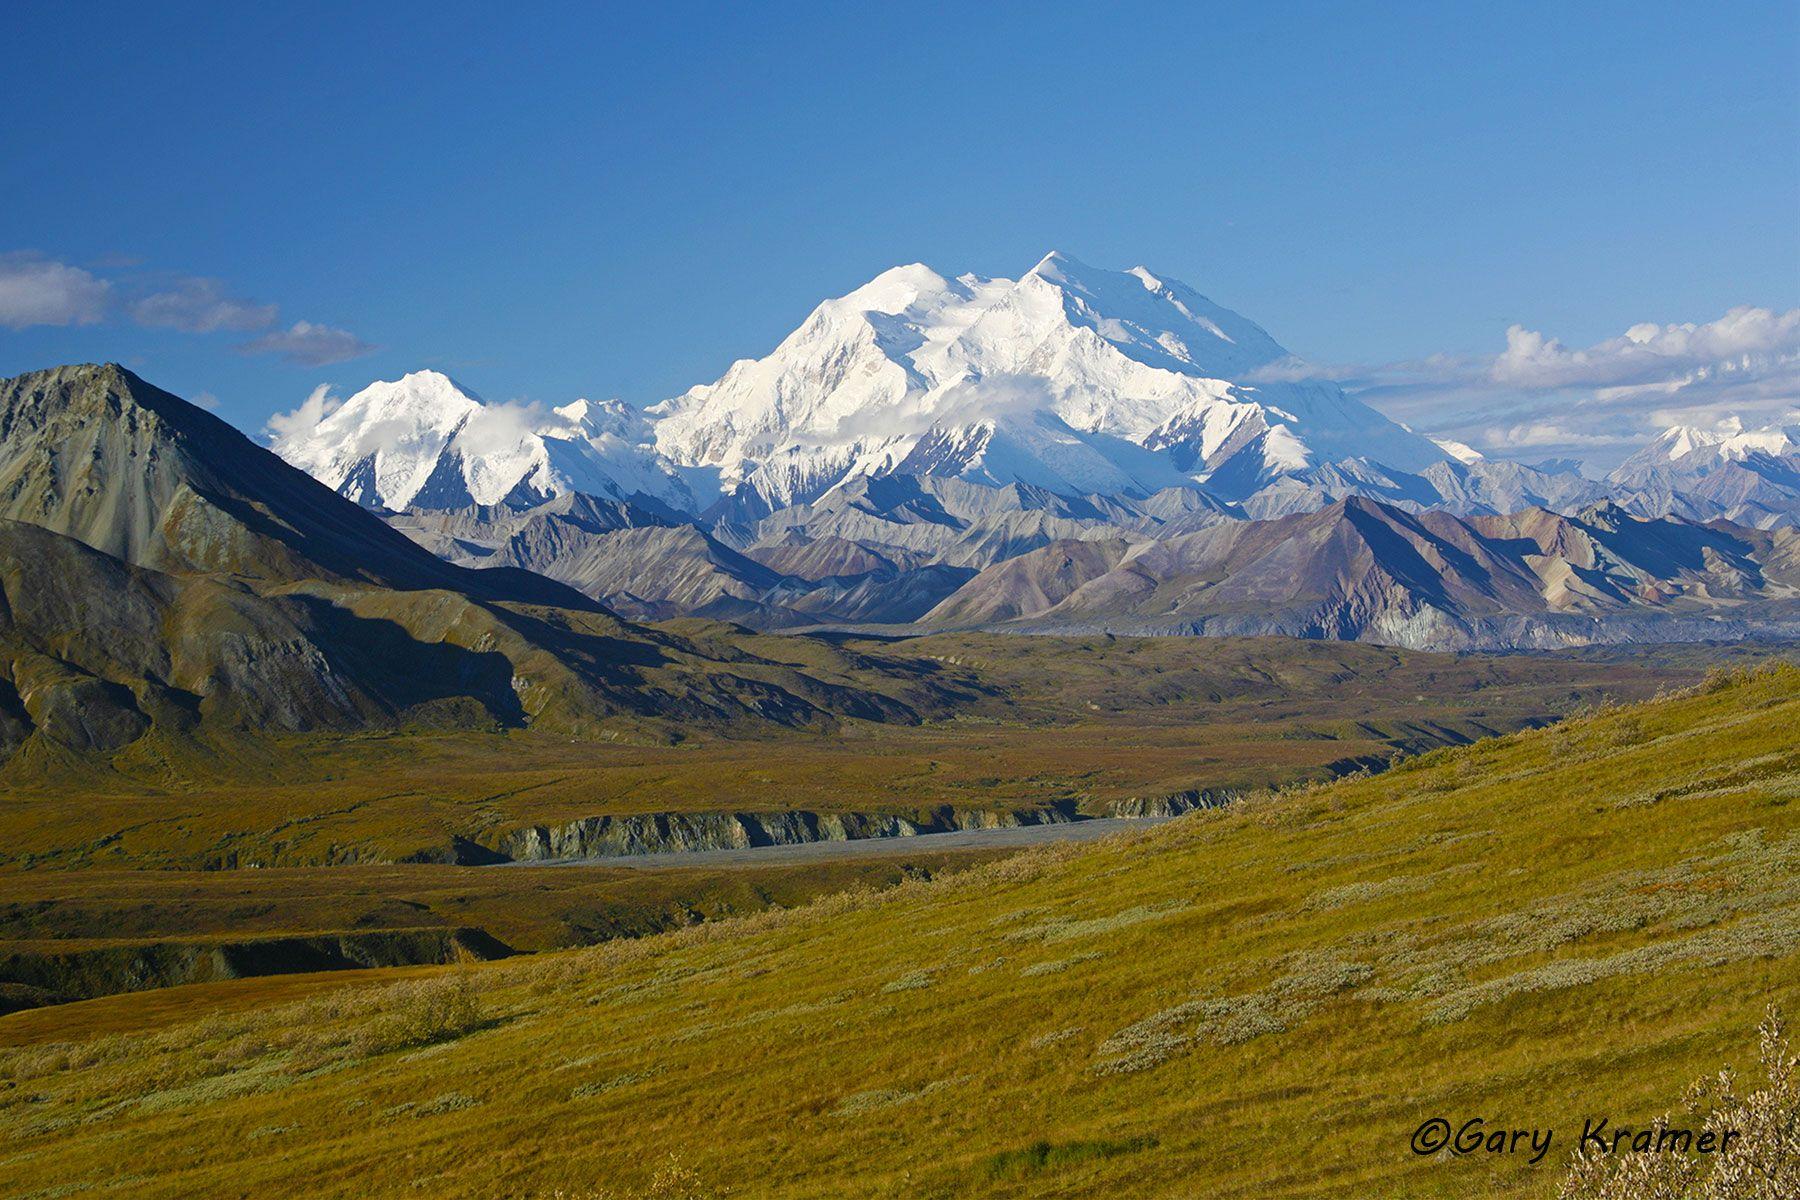 Mt. McKinley, Denali National Park, Alaska - NSAM#062d